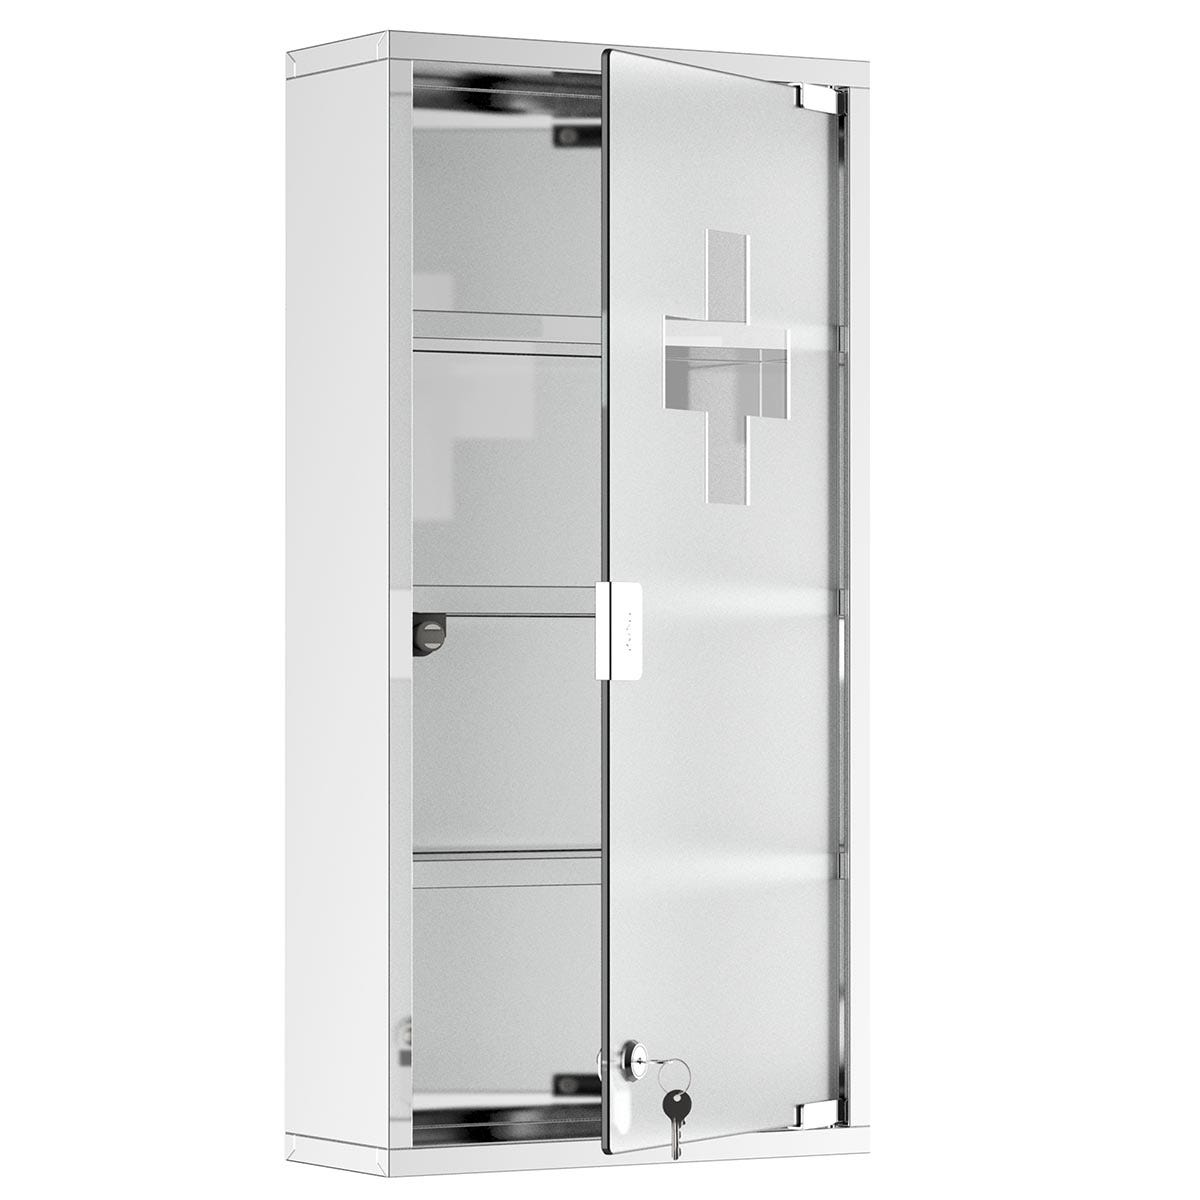 HOMCOM Medicine Cabinet, Stainless Steel With Glass Door - Silver